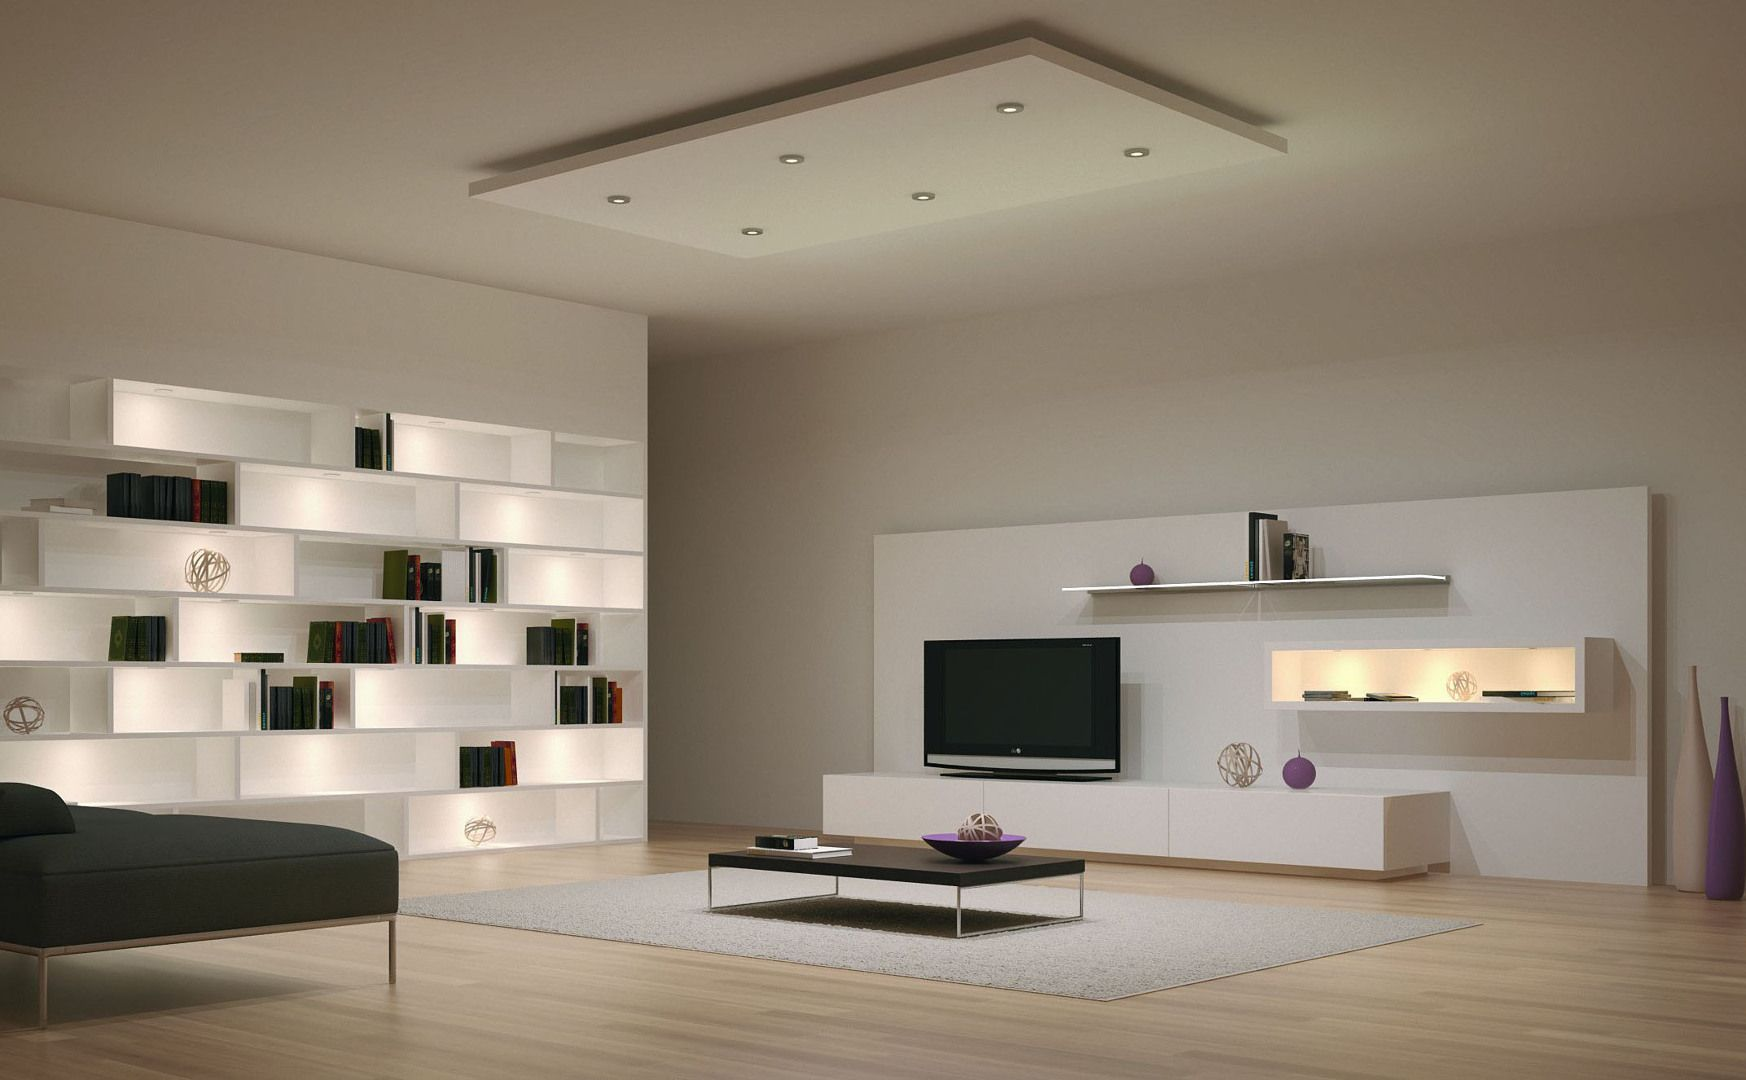 Illuminazione a led per salotto cartongesso living room lighting